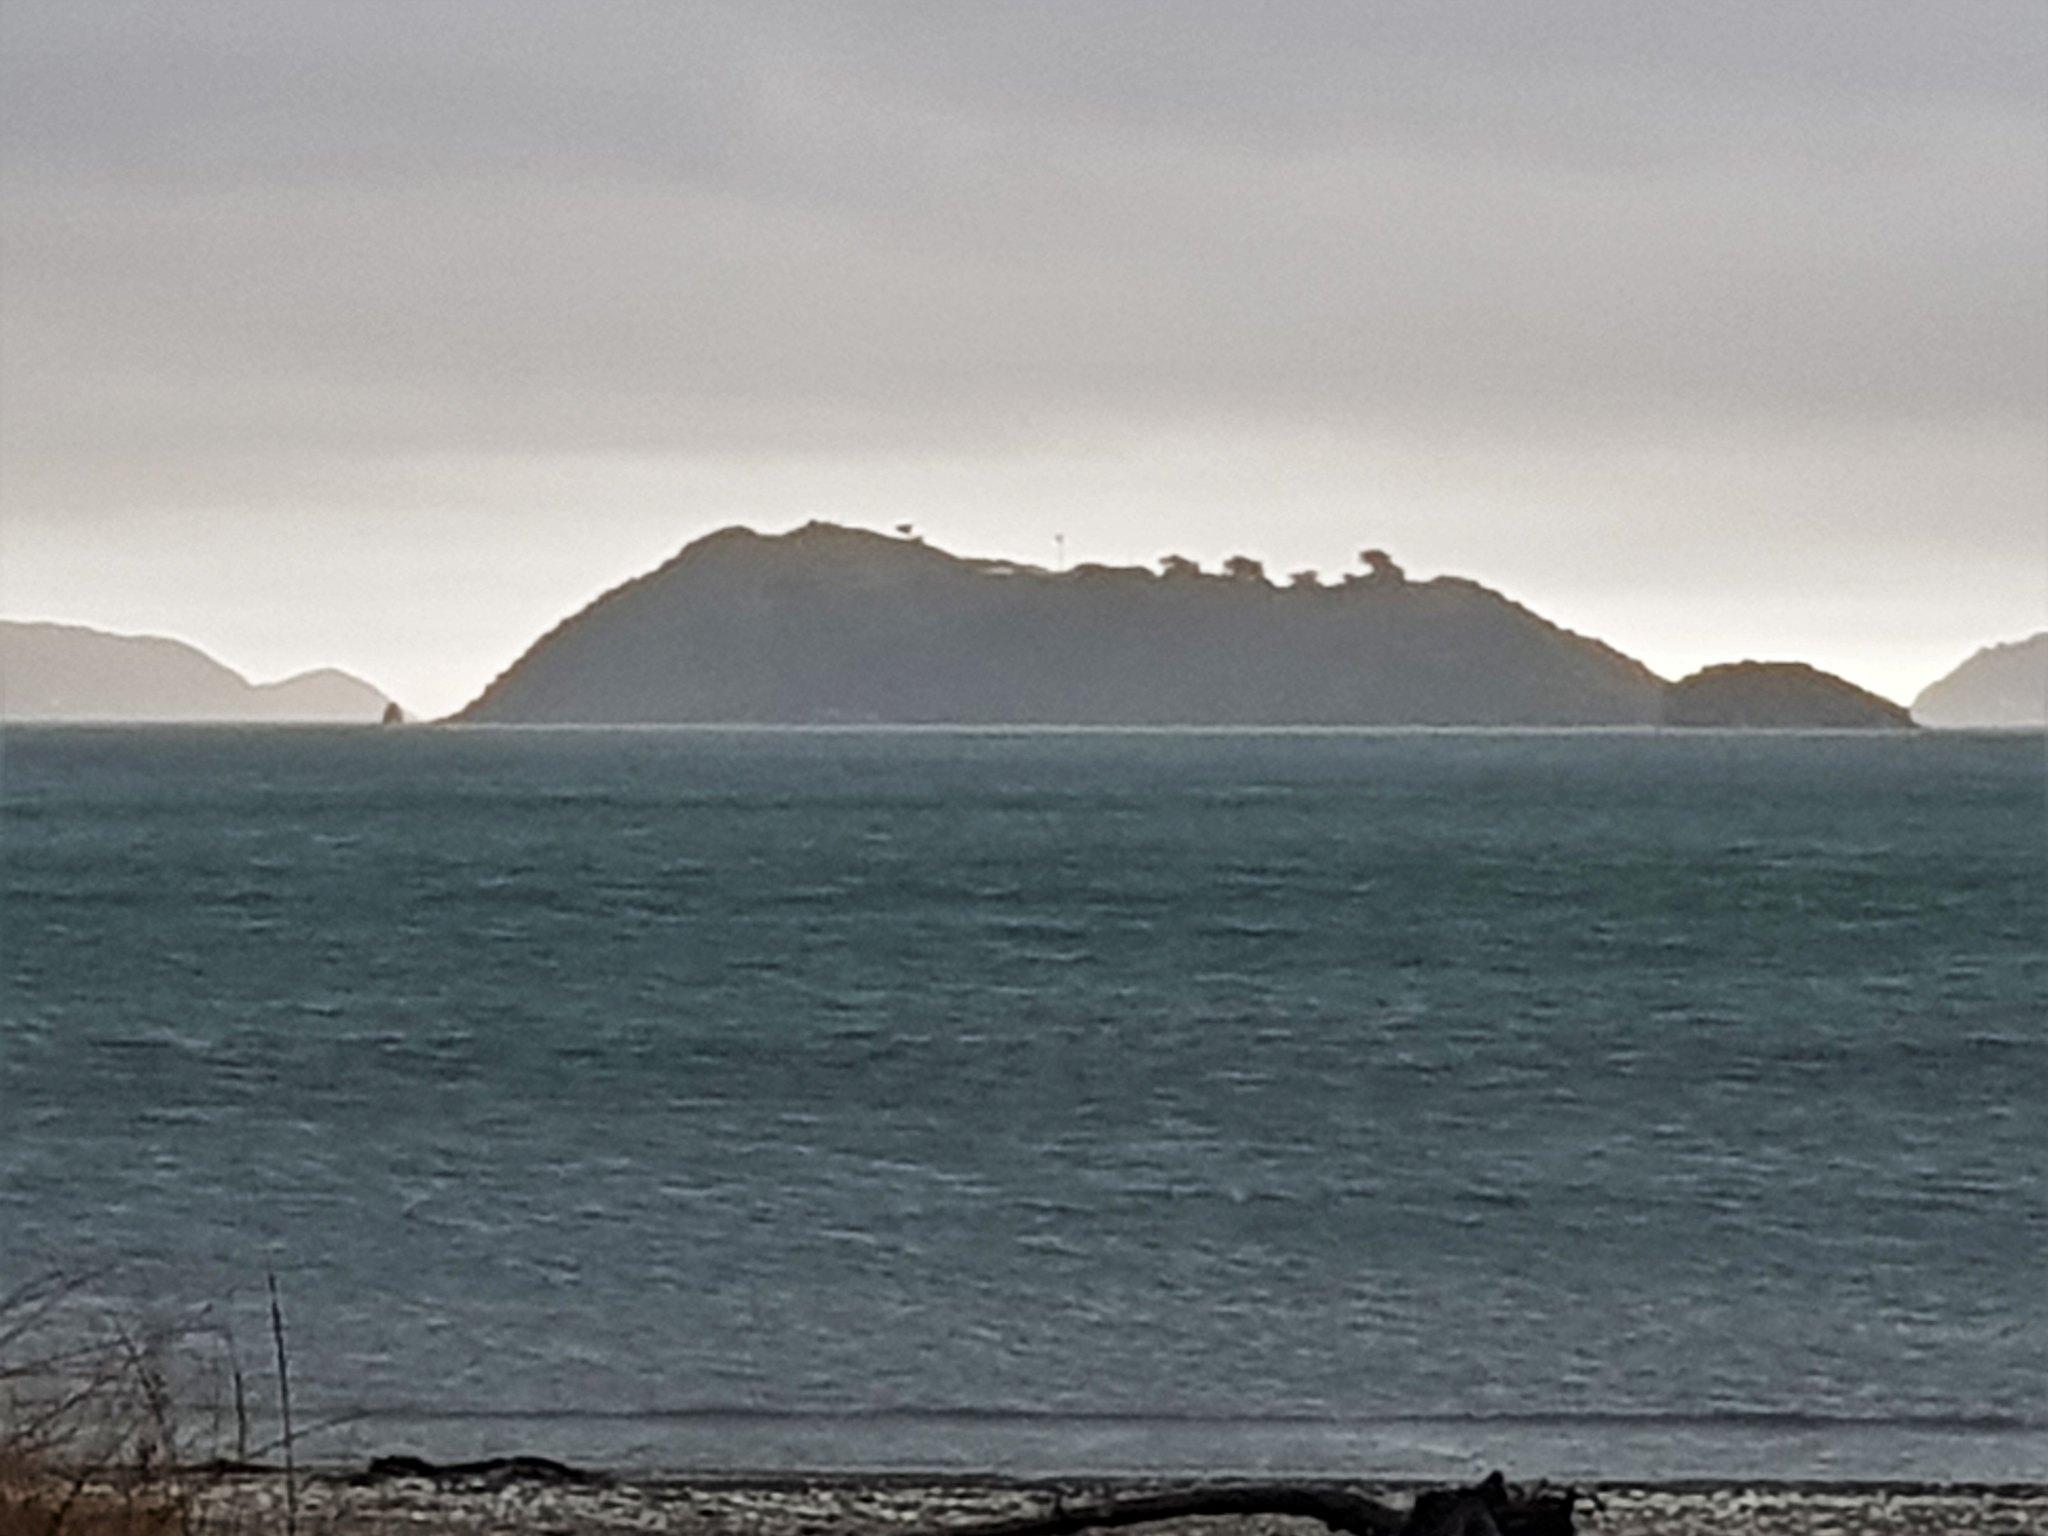 20181108_194014 (The island)